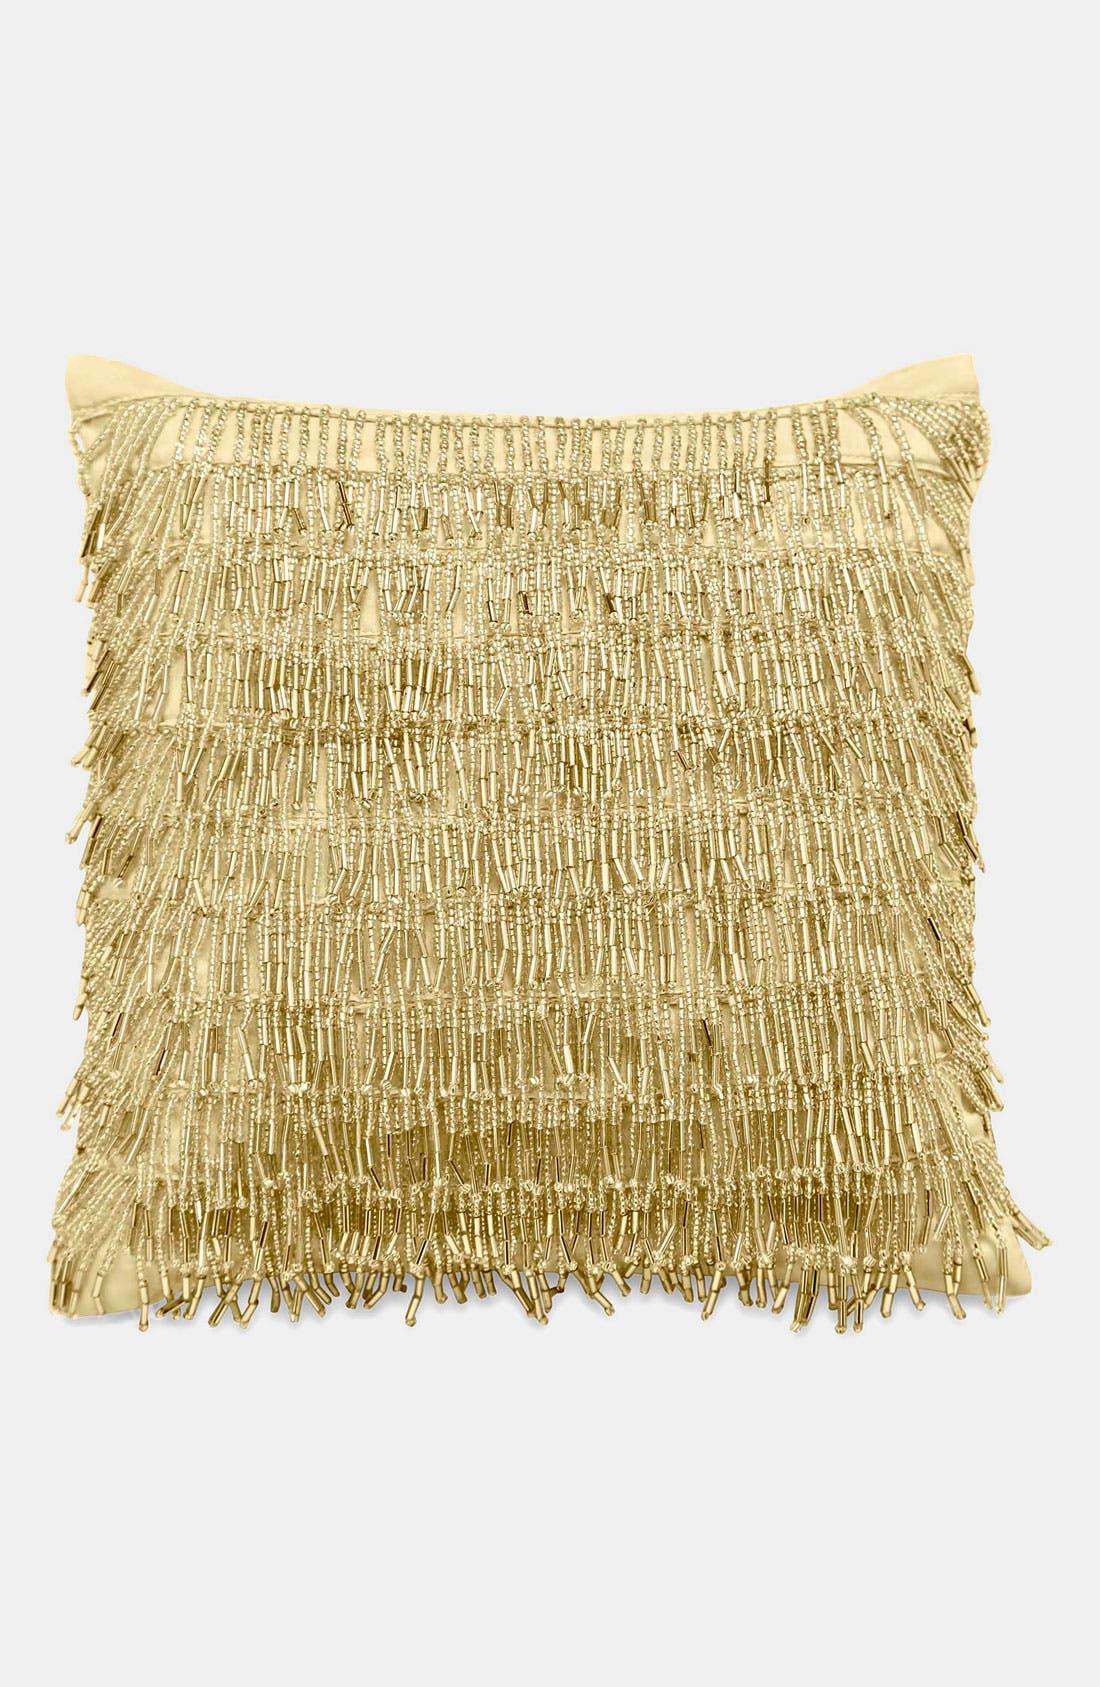 Alternate Image 1 Selected - Donna Karan 'Dancing Gold' Silk Pillow (Online Only)